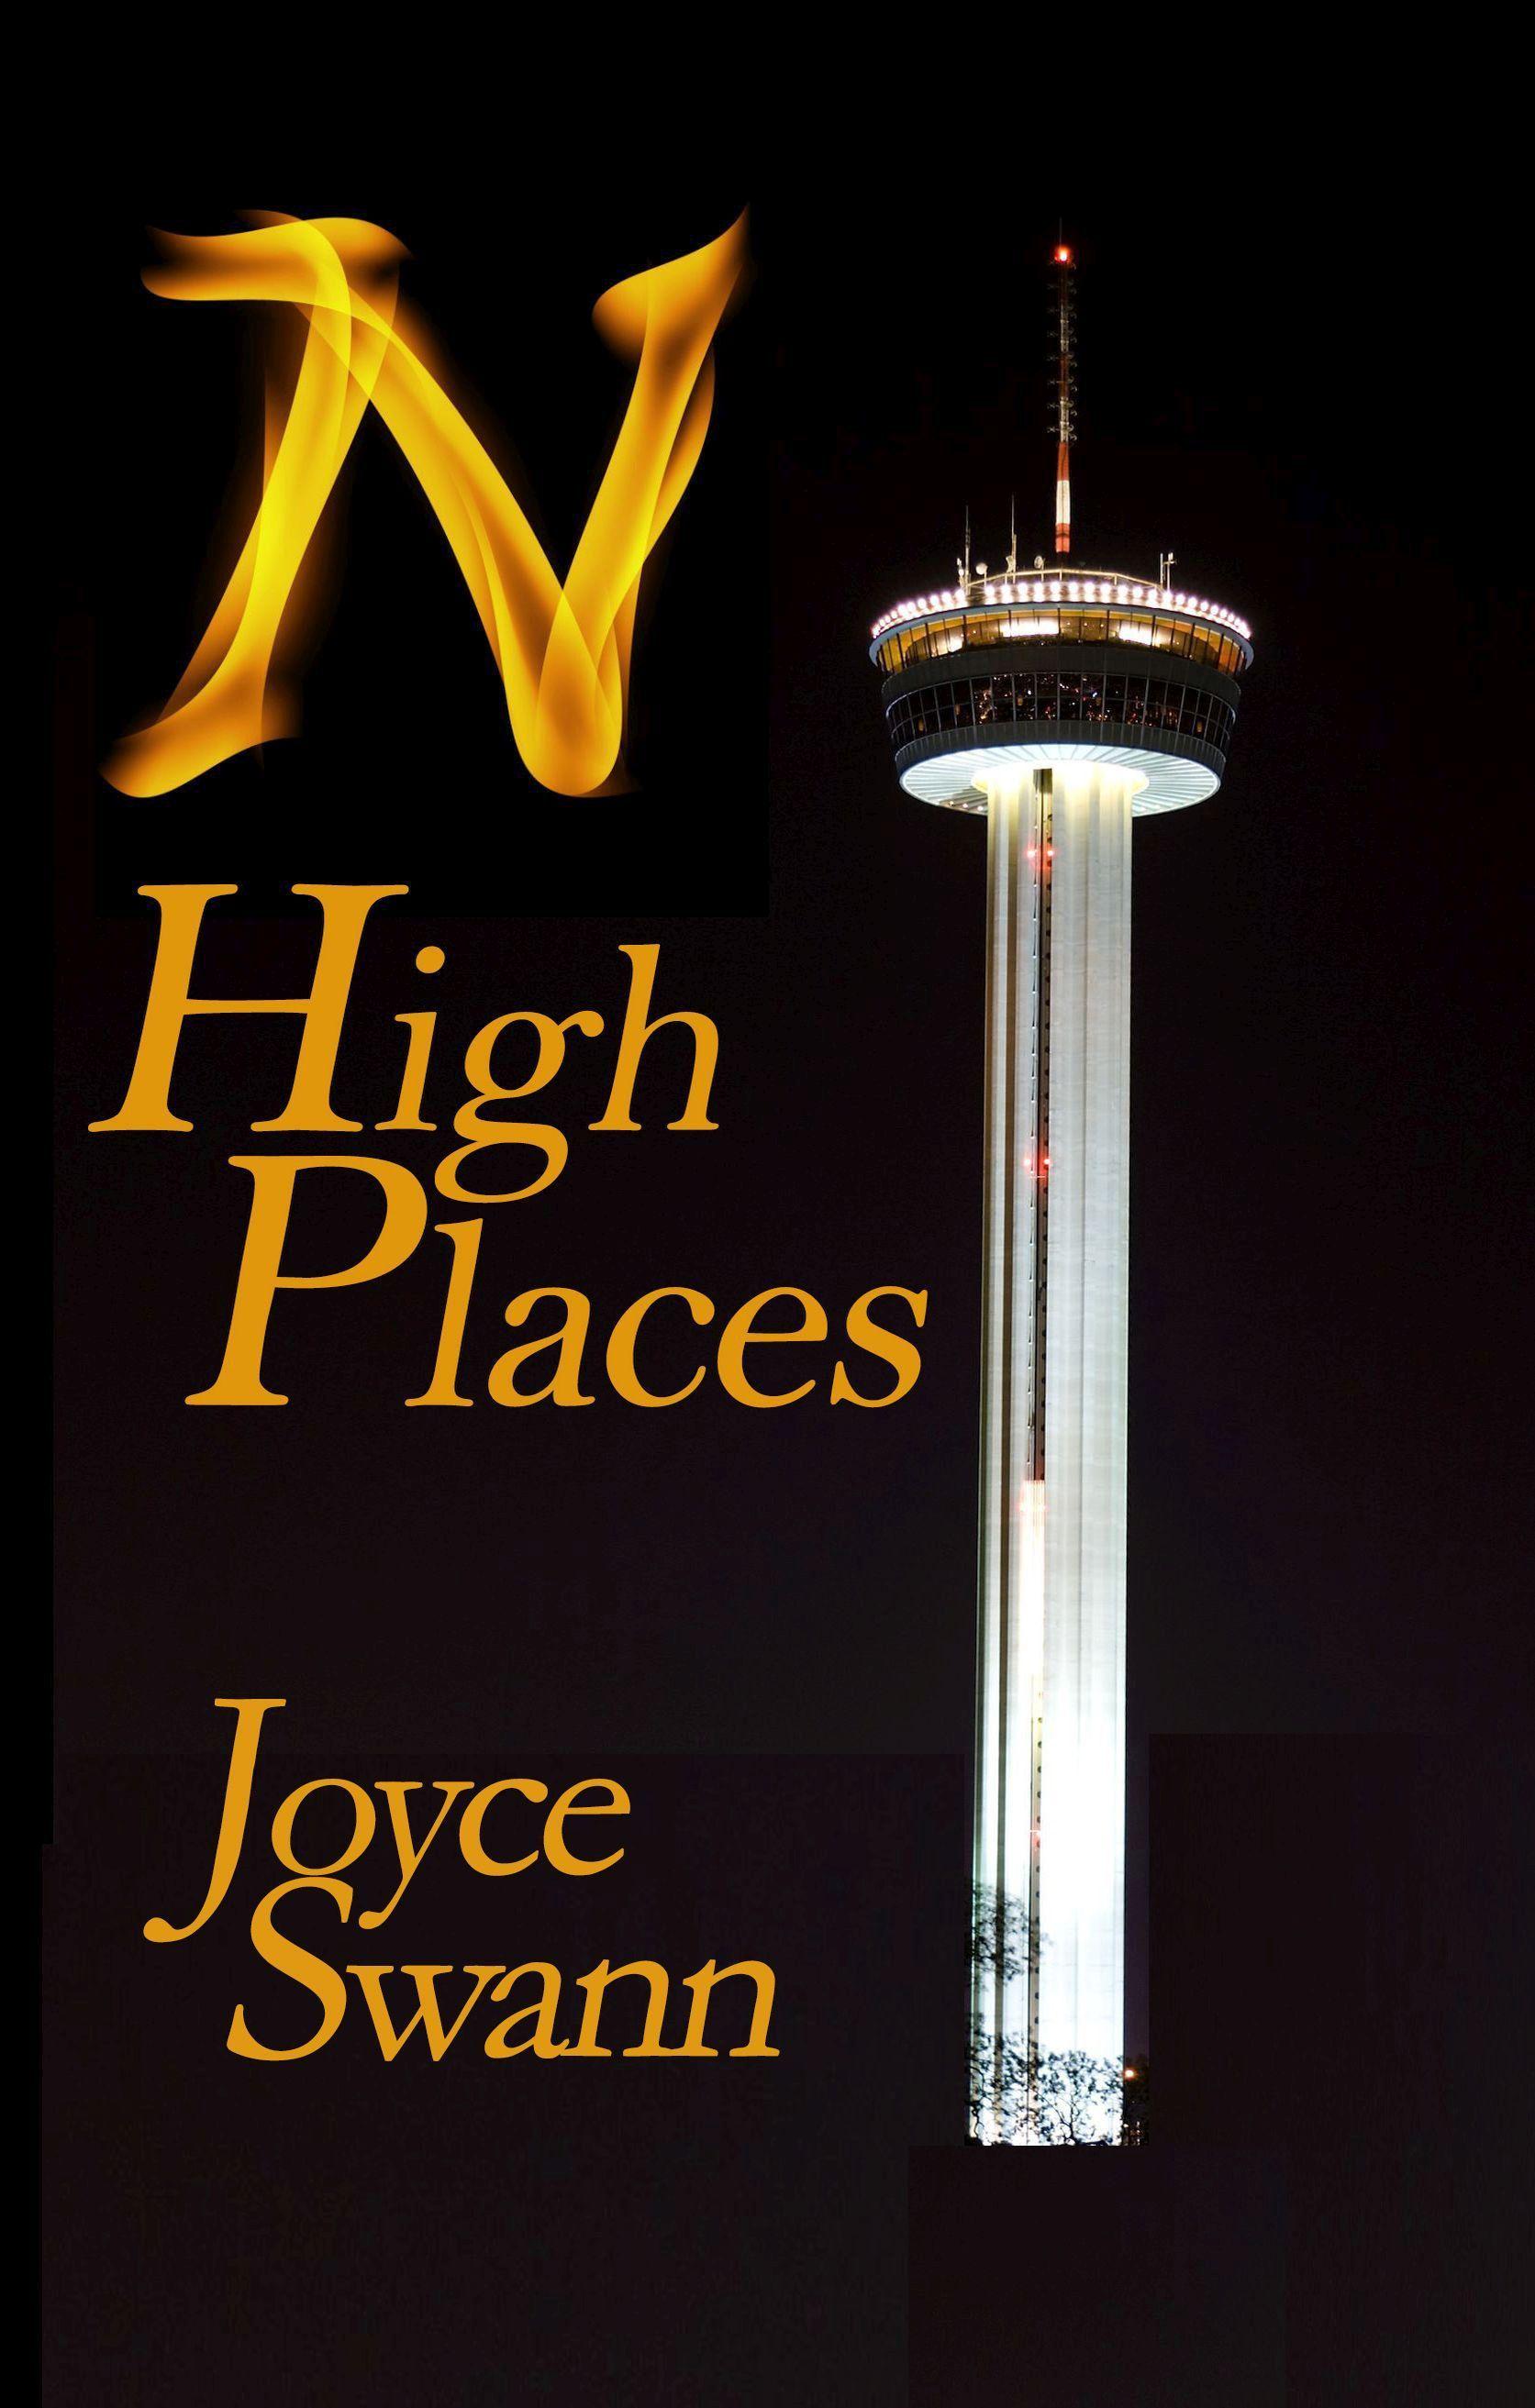 https://0201.nccdn.net/1_2/000/000/14c/36c/n-high-places-kindle-cover.jpg